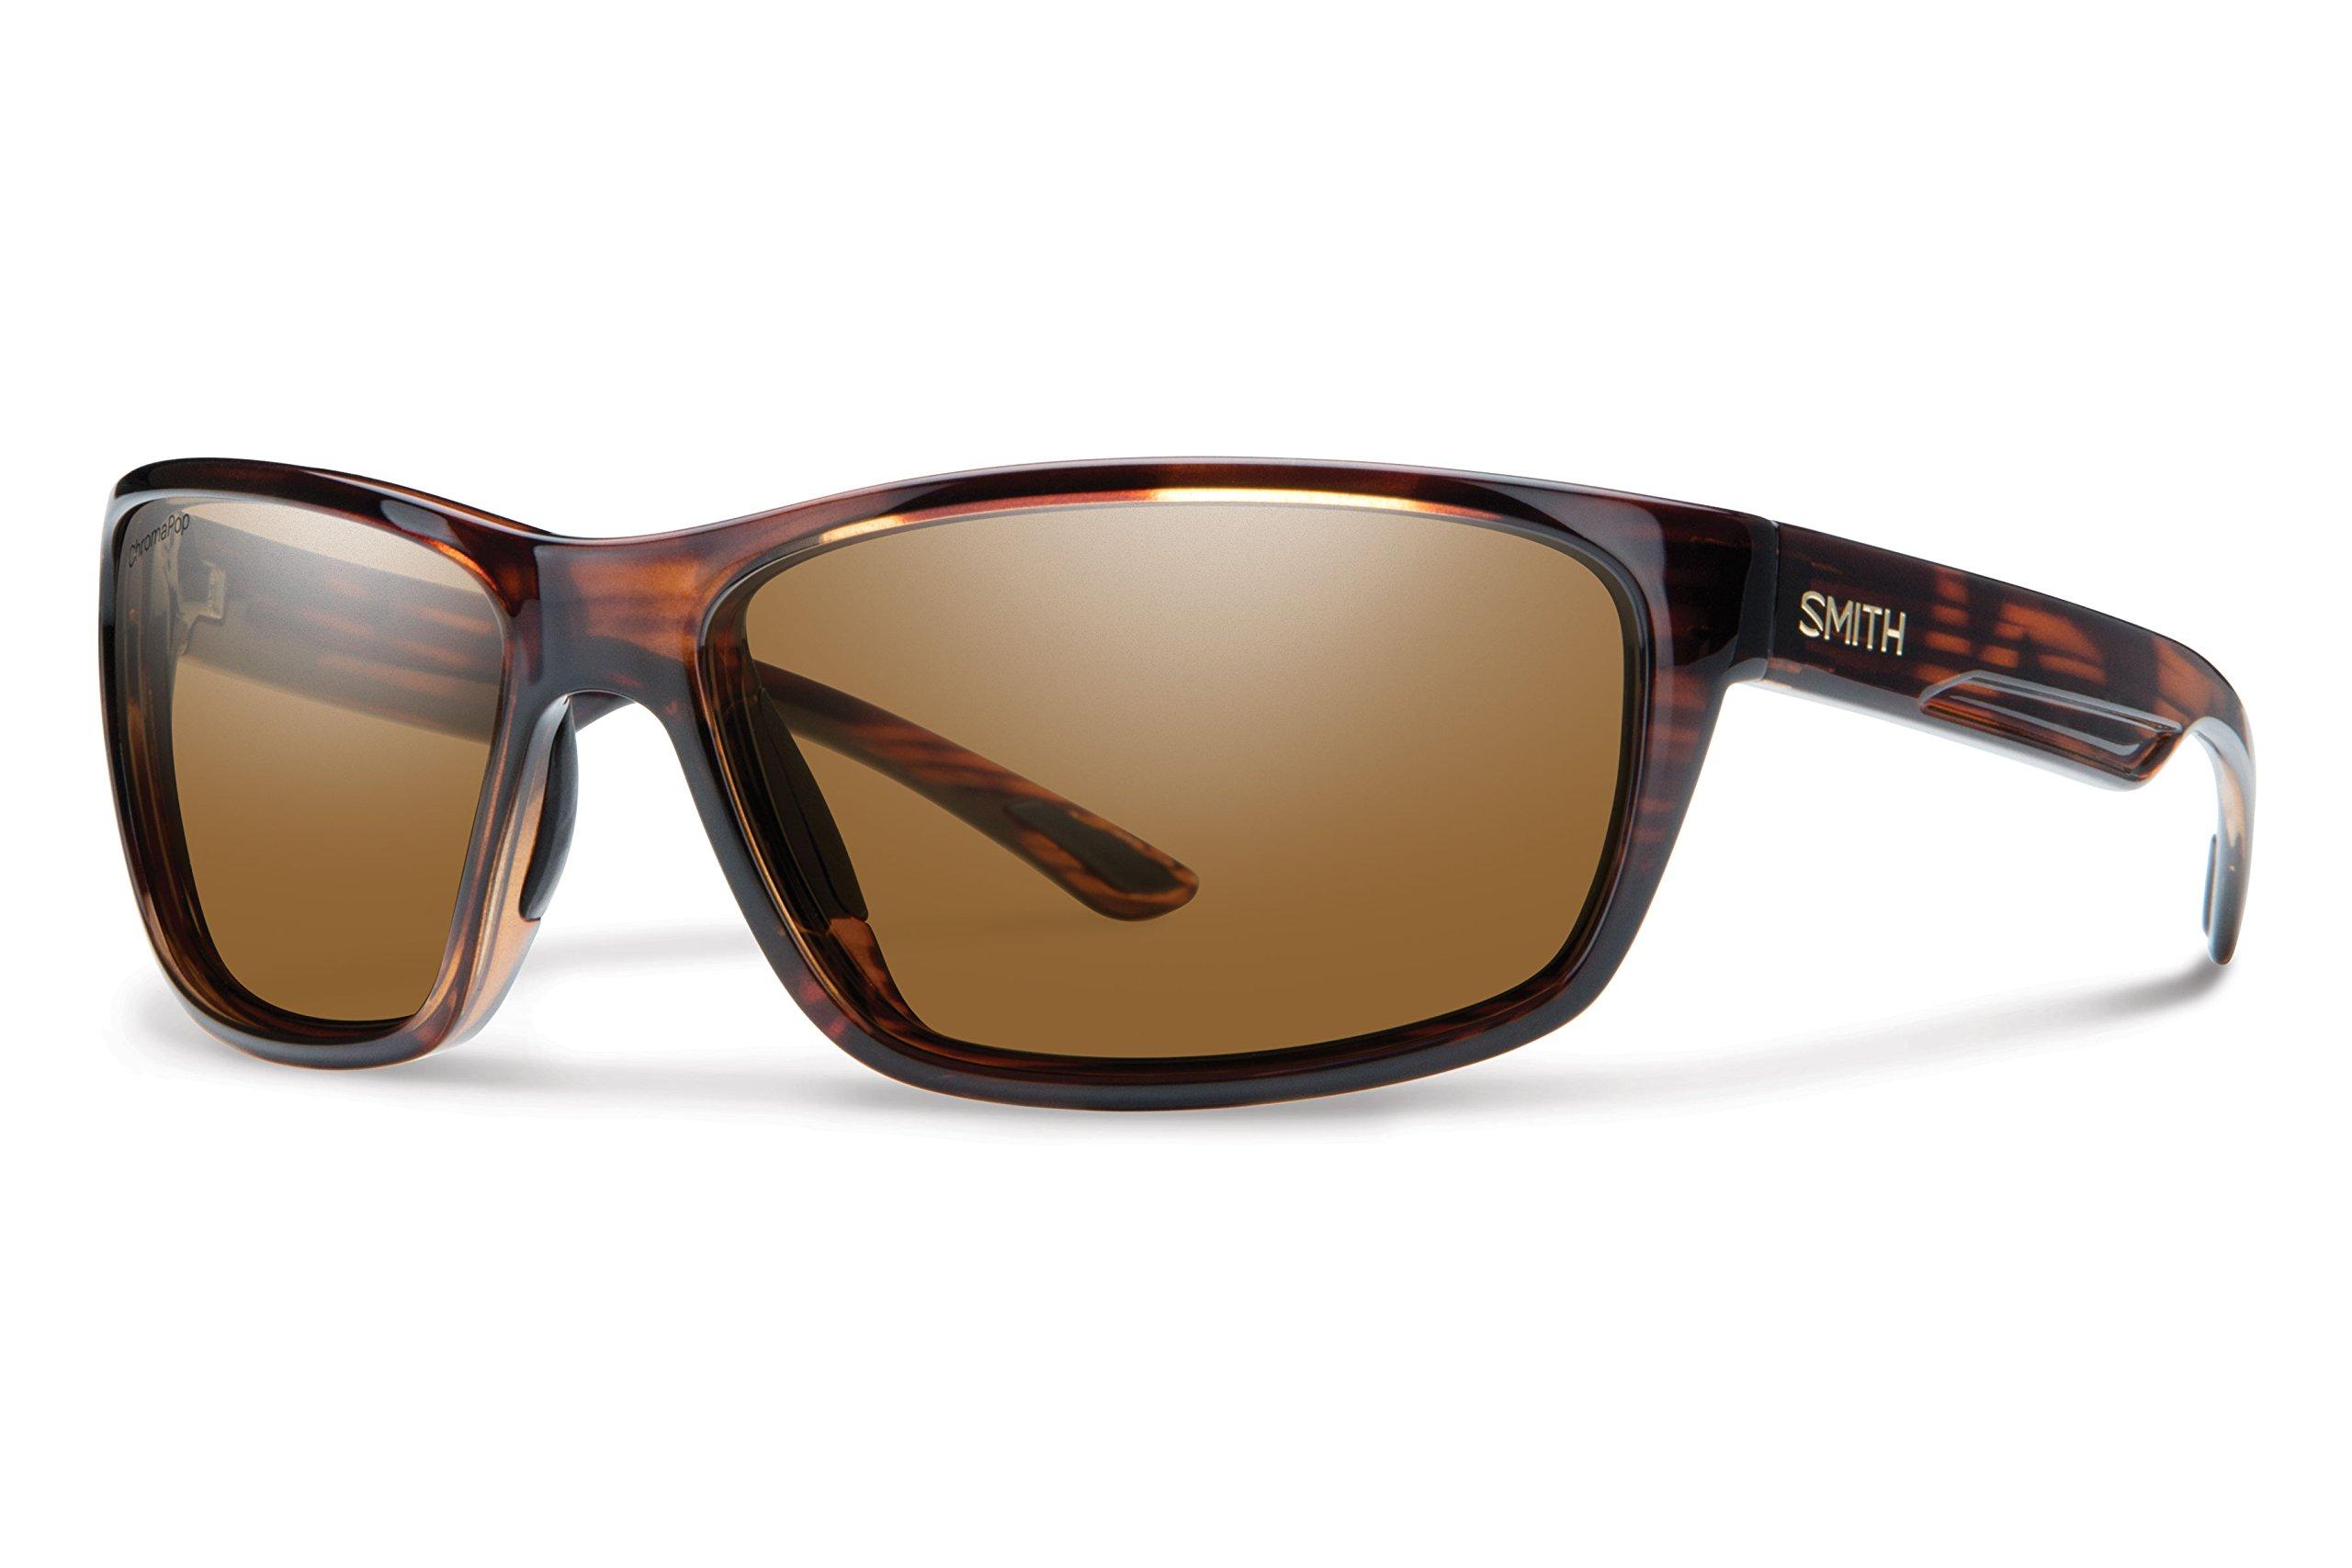 Smith Optics Mens Redmond Lifestyle Polarized Sunglasses - Tortoise/ChromaPop Brown